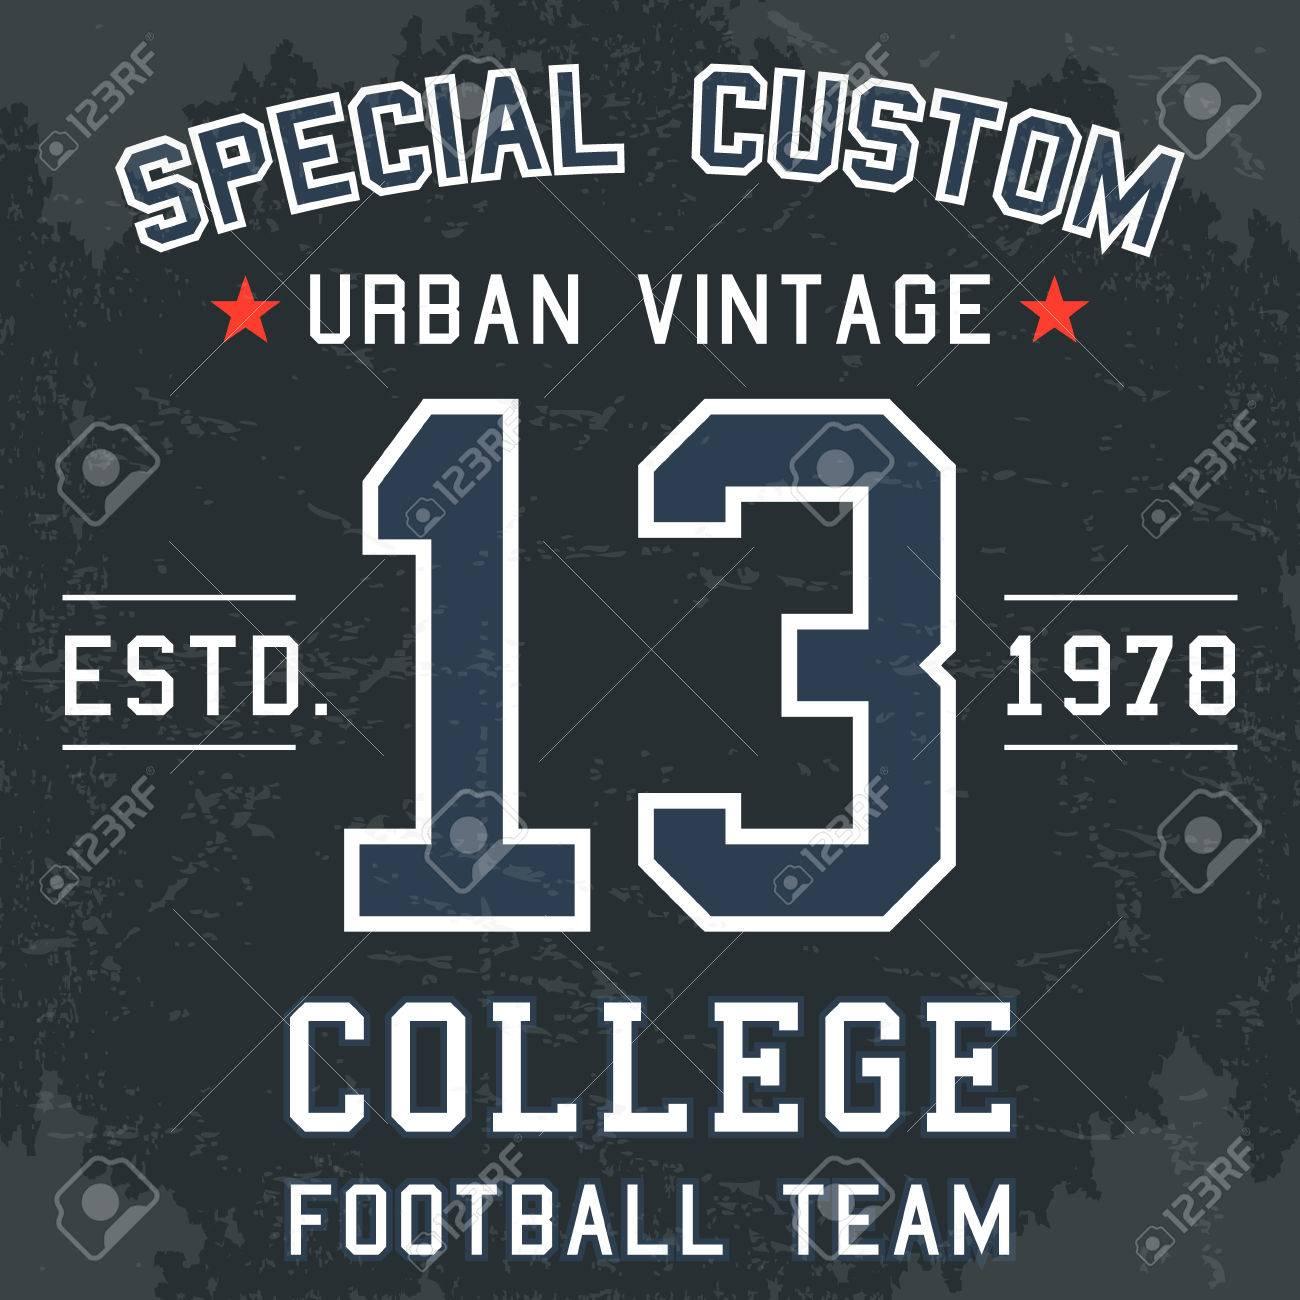 T shirt poster design - T Shirt Print Design Vintage Football Team Number 13 Poster Stock Vector